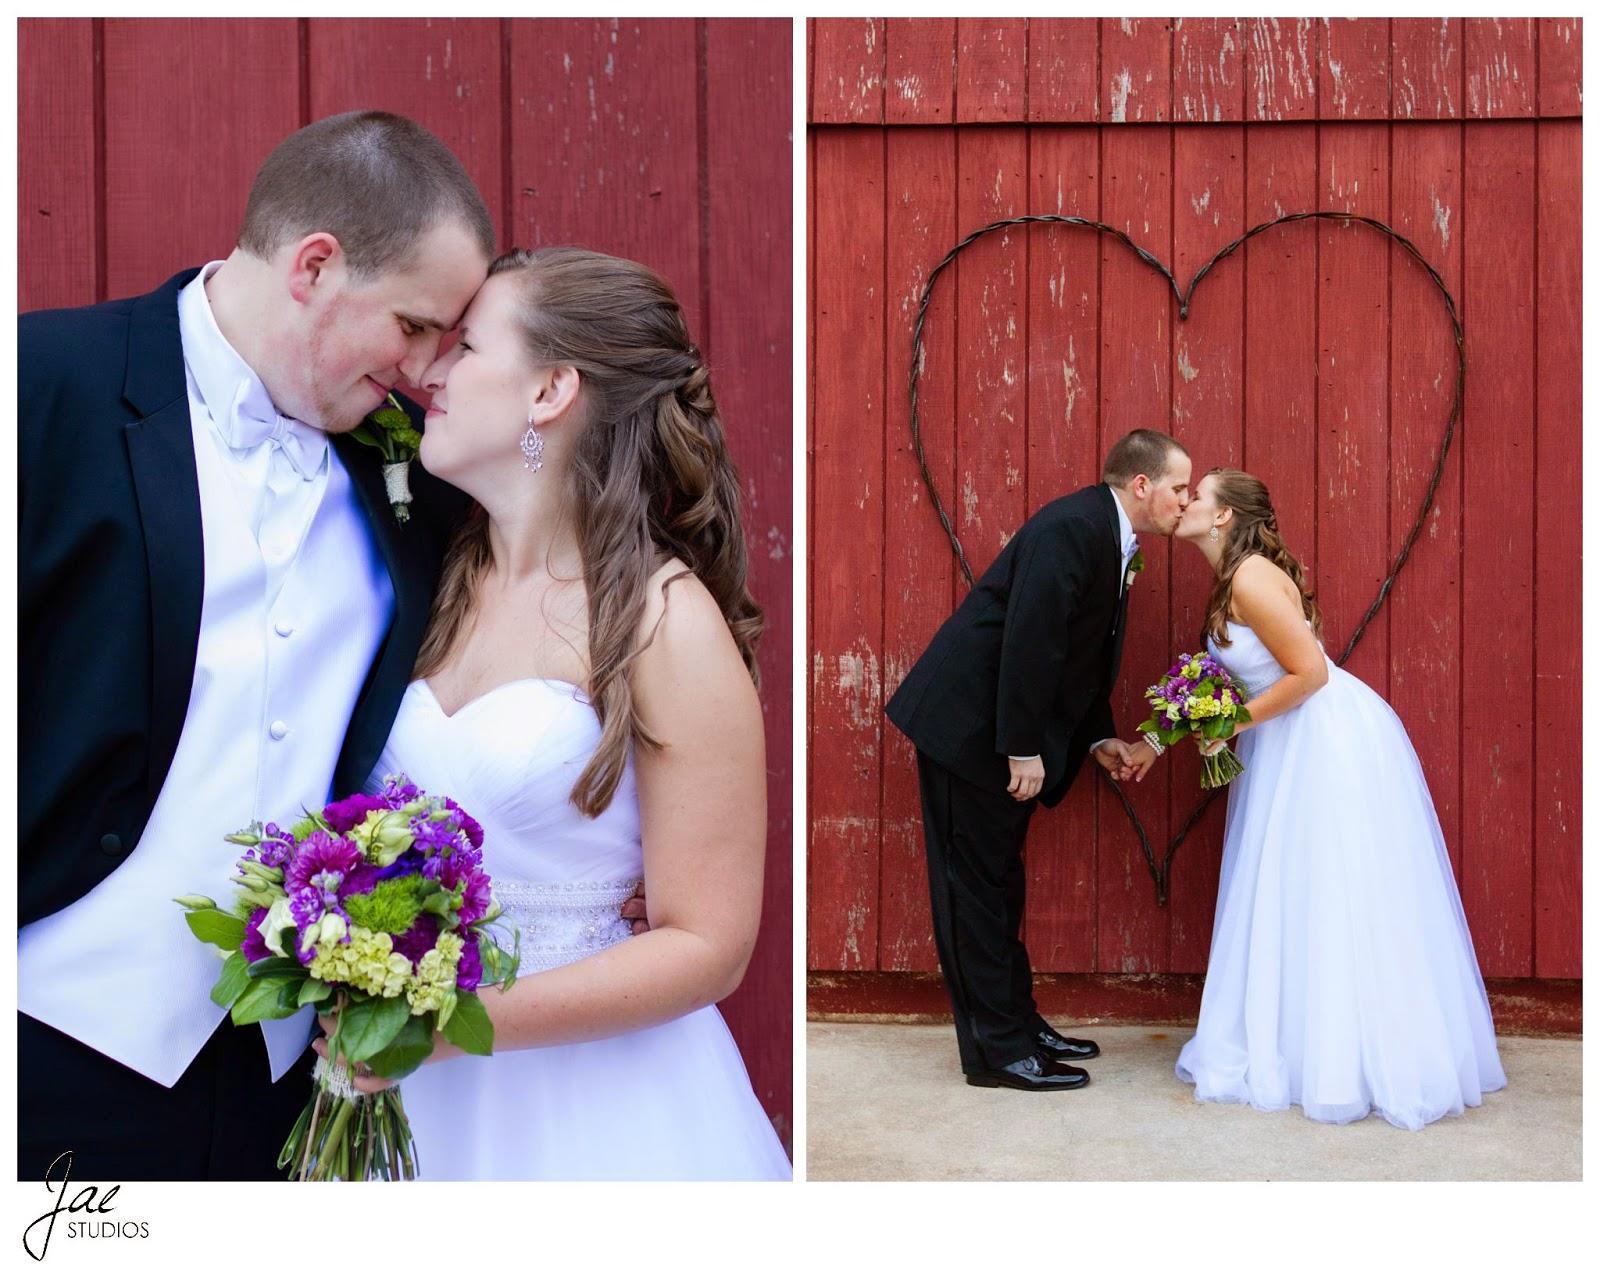 Jonathan and Julie, Bird cage, West Manor Estate, Wedding, Lynchburg, Virginia, Jae Studios, wedding dress, tuxedo, bride, groom, boutonniere, bouquet, kissing, heart, red, barn door